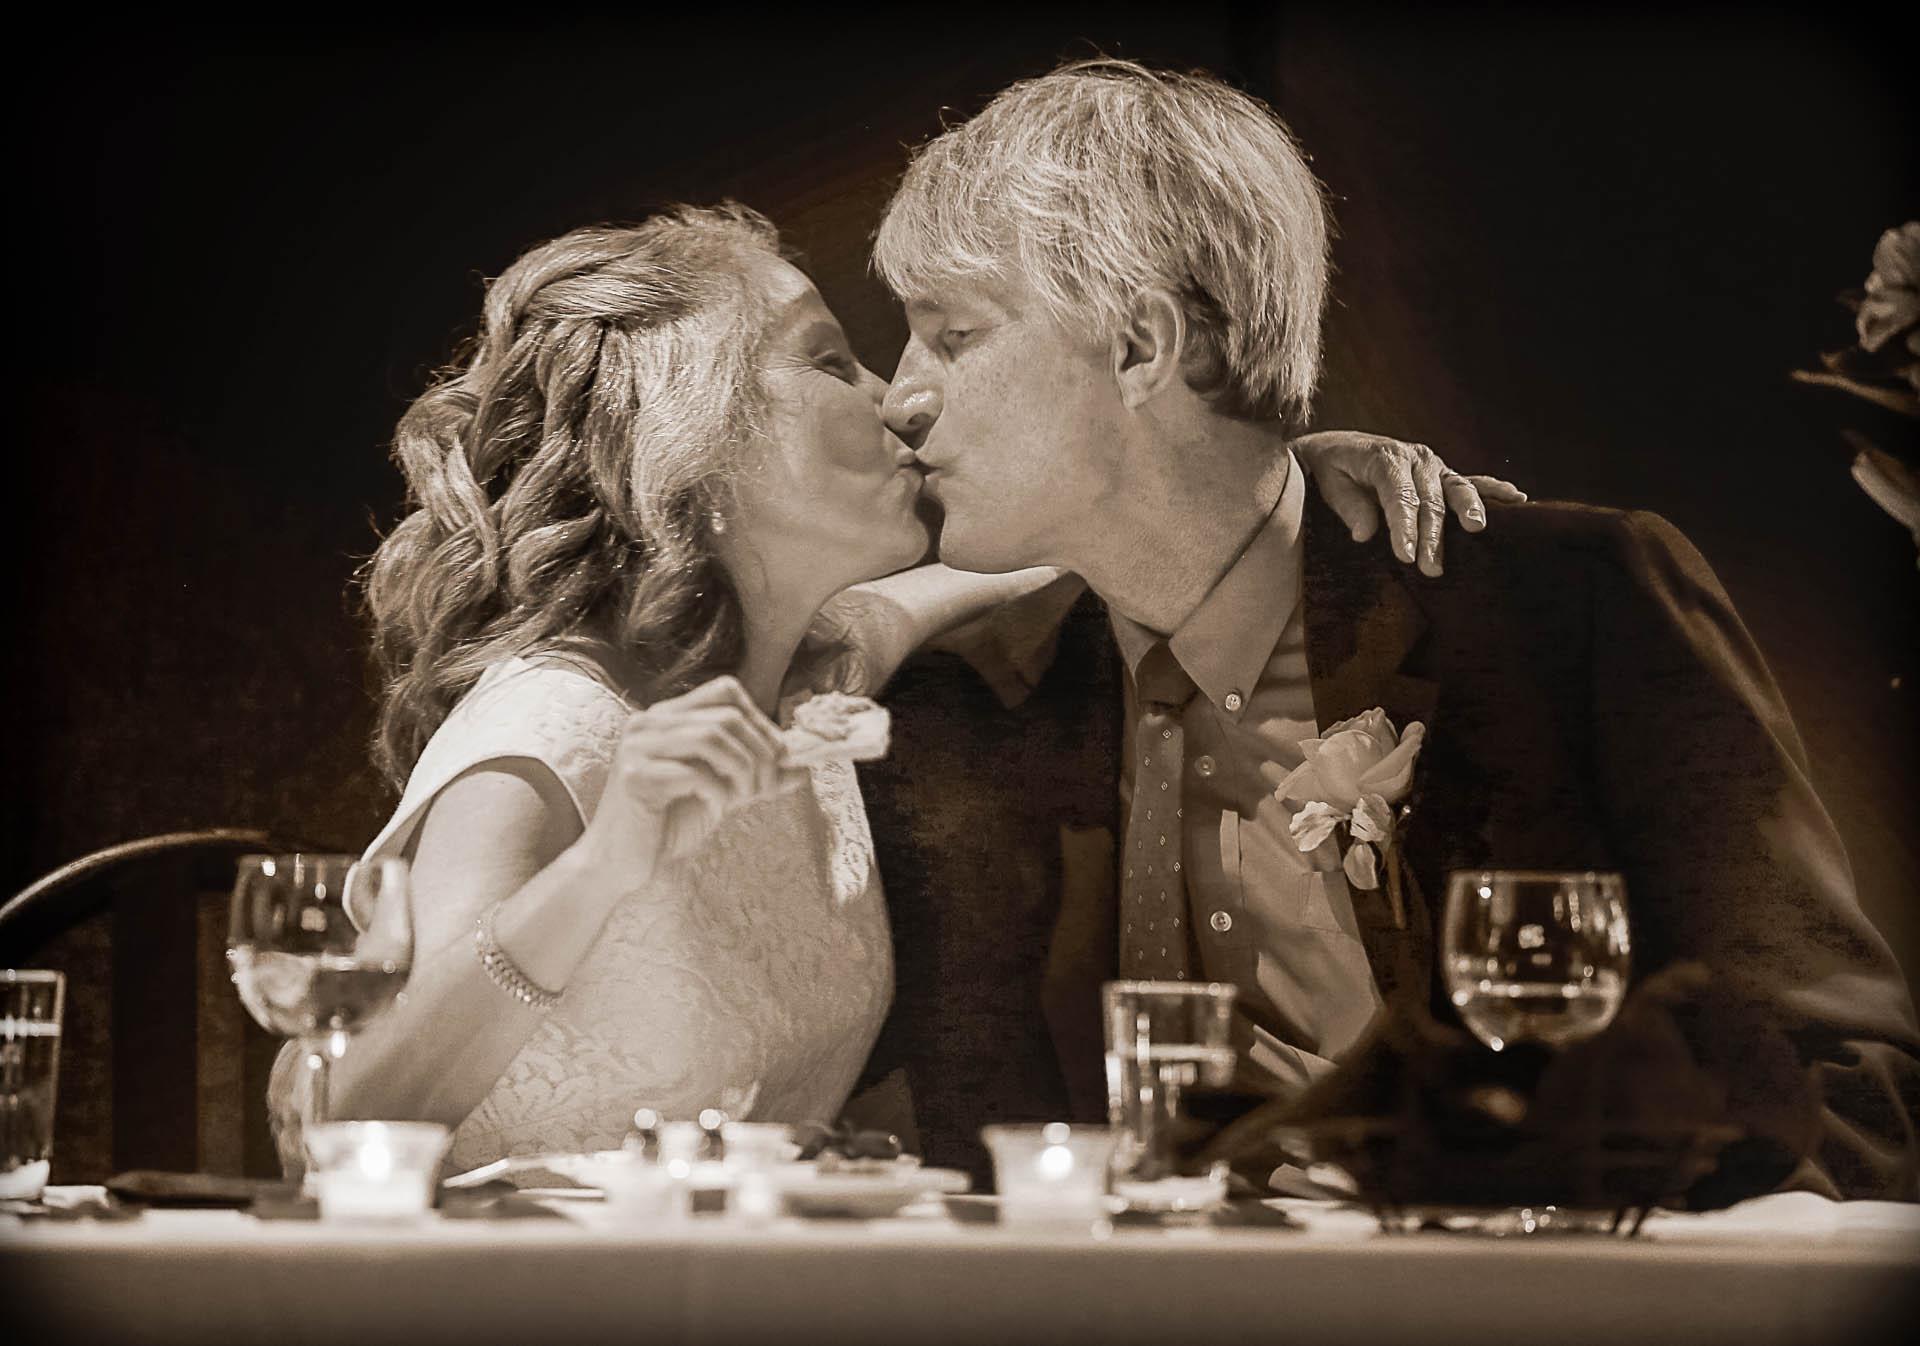 WEDDING-Karen-Mark-28Sep2014-MTO1492.jpg